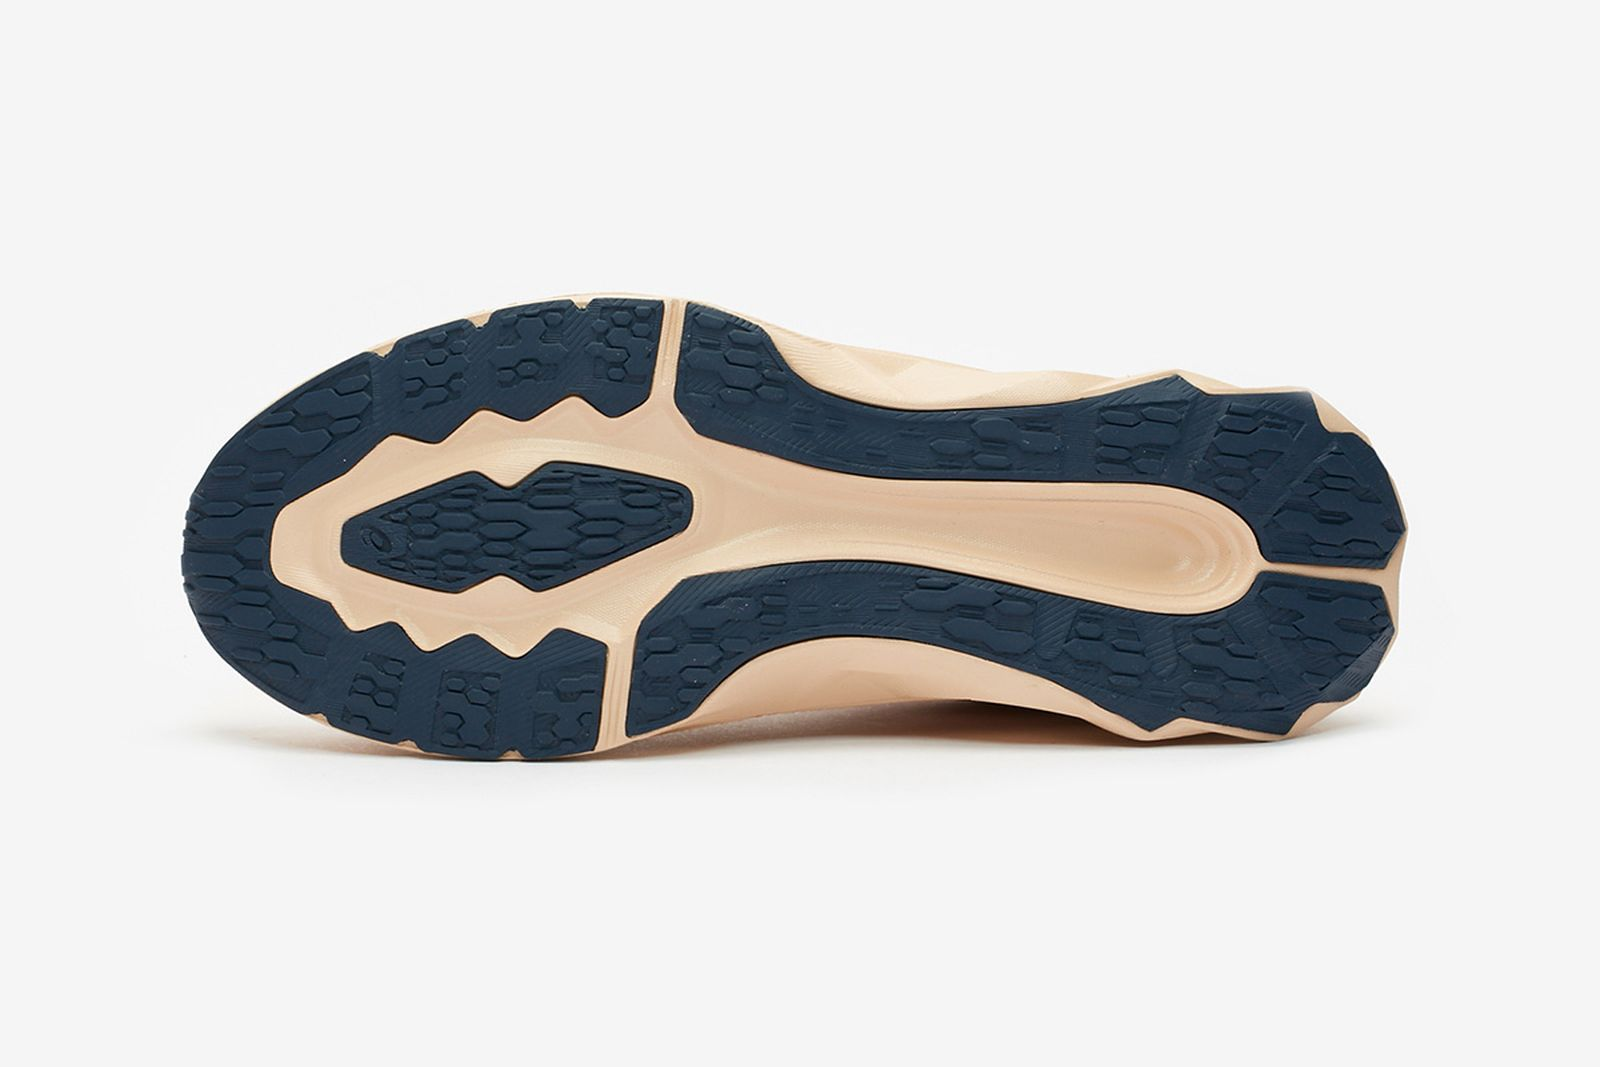 sneakersnstuff-asics-novablast-release-date-price-01